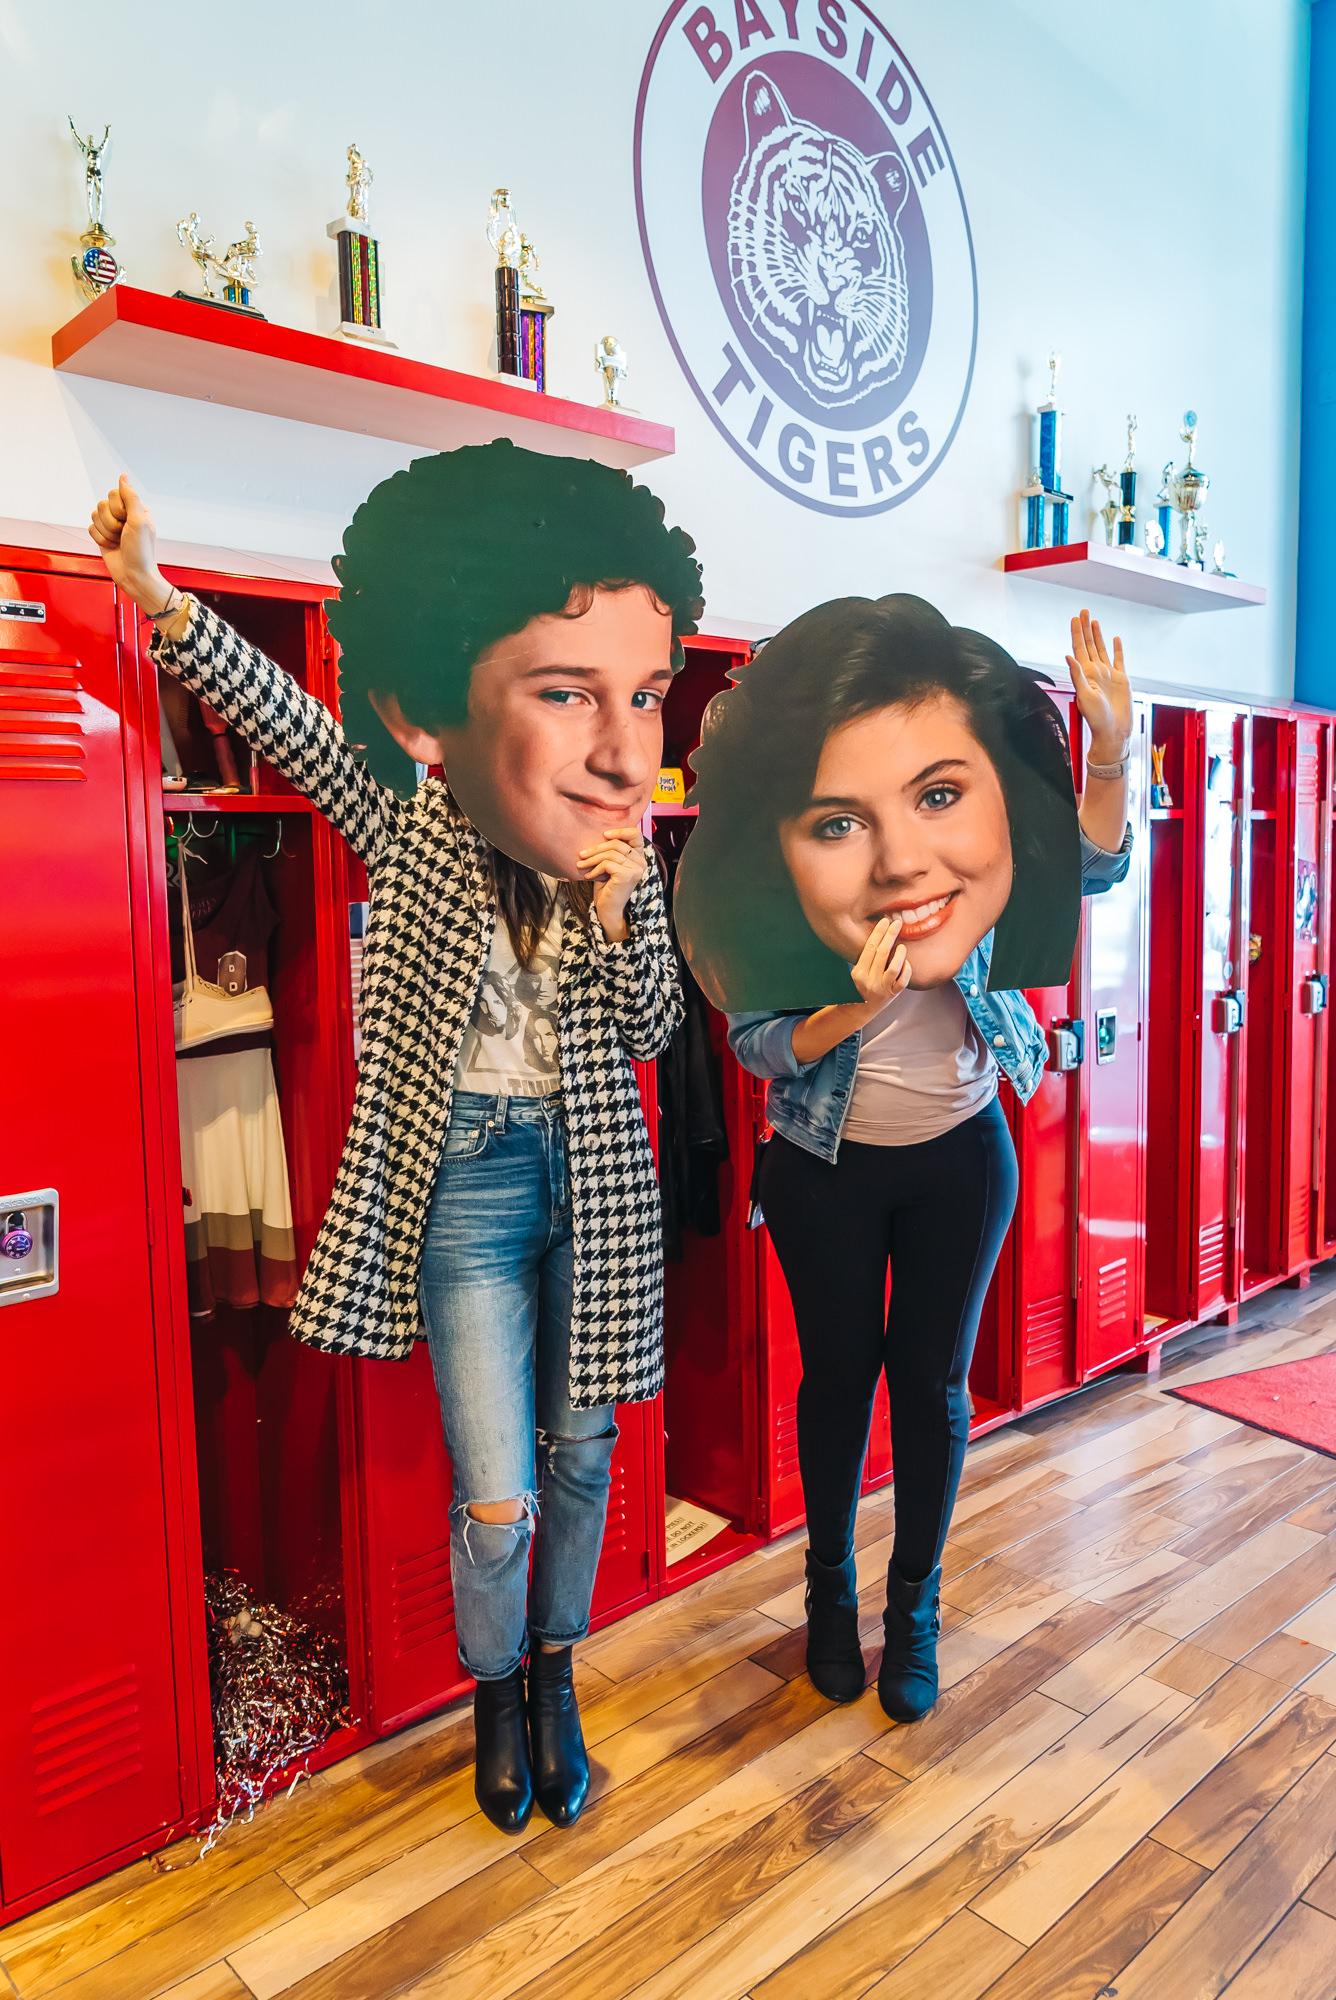 Fun Cutout heads of Screech and Kelly